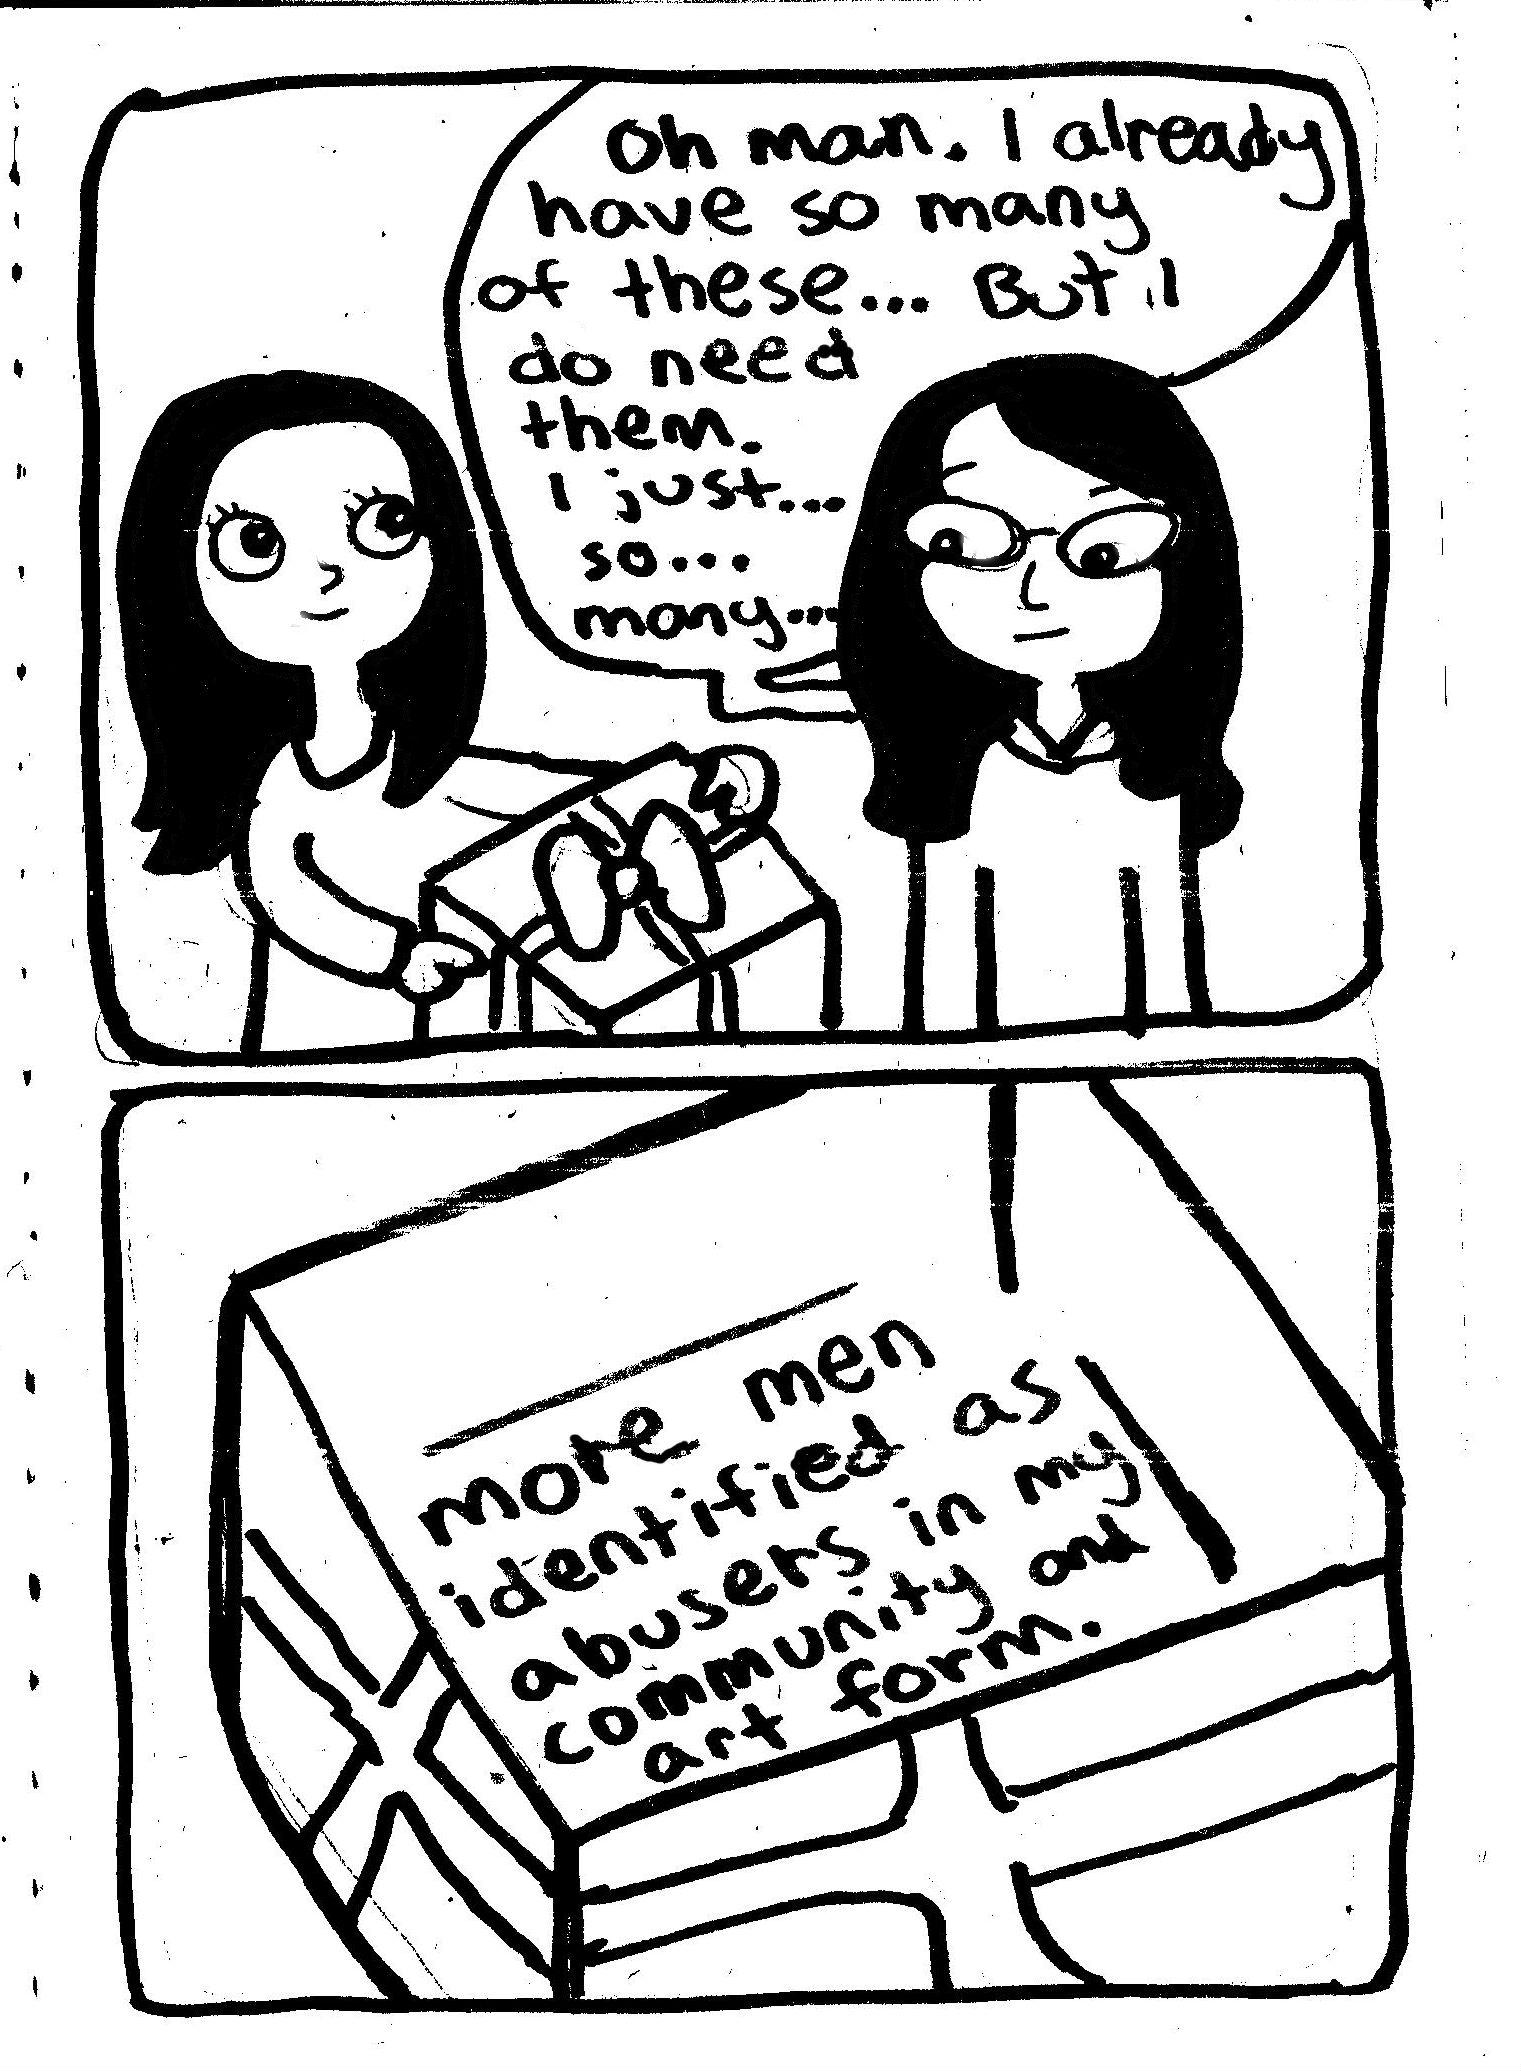 too many presents